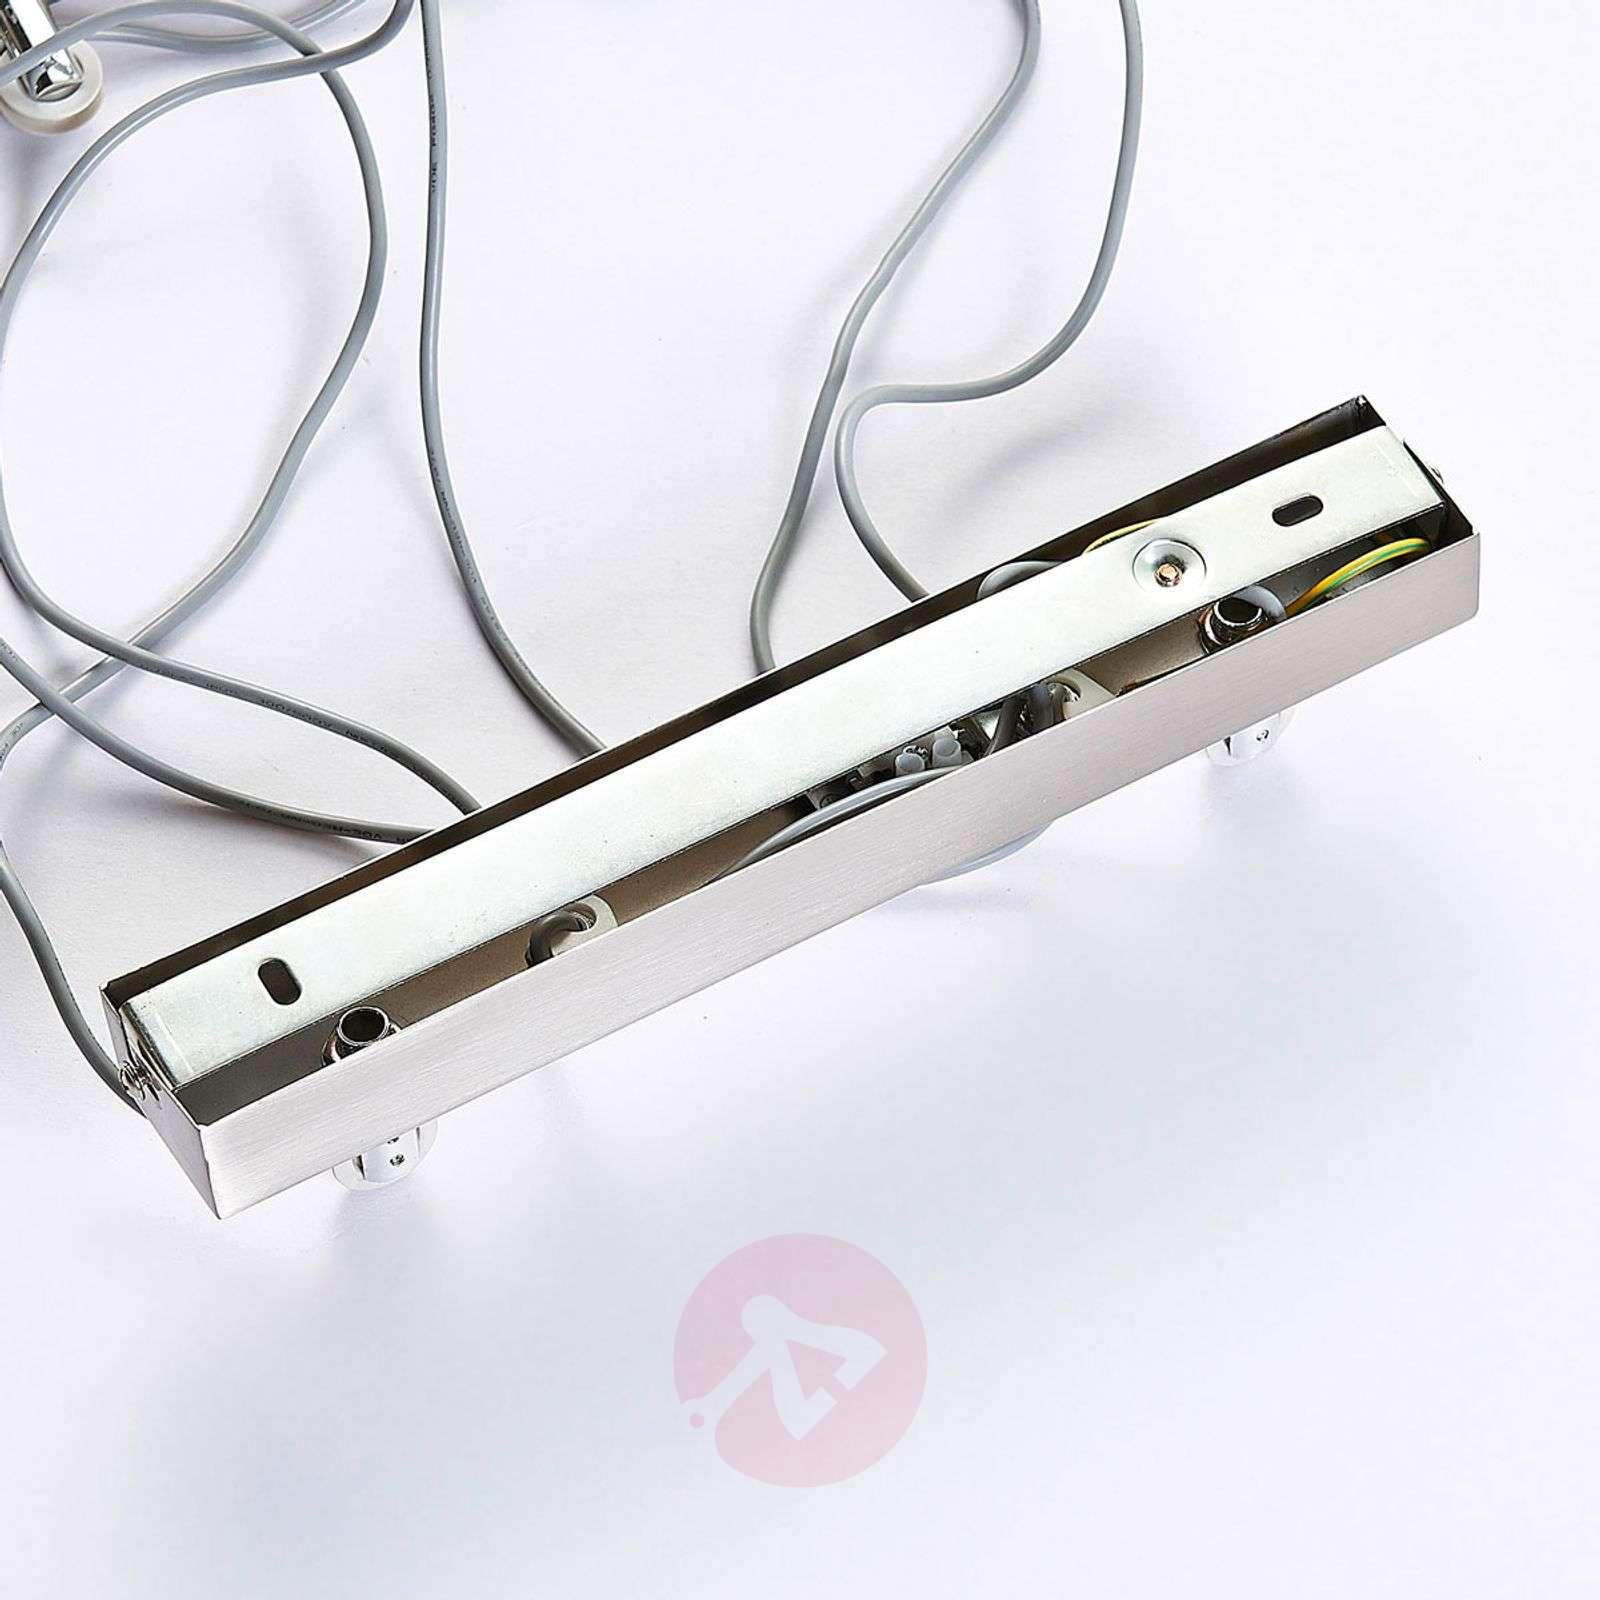 LED-riippuvalo Eleasa, easydim, 4-sarja, nikkeli-9621386-02